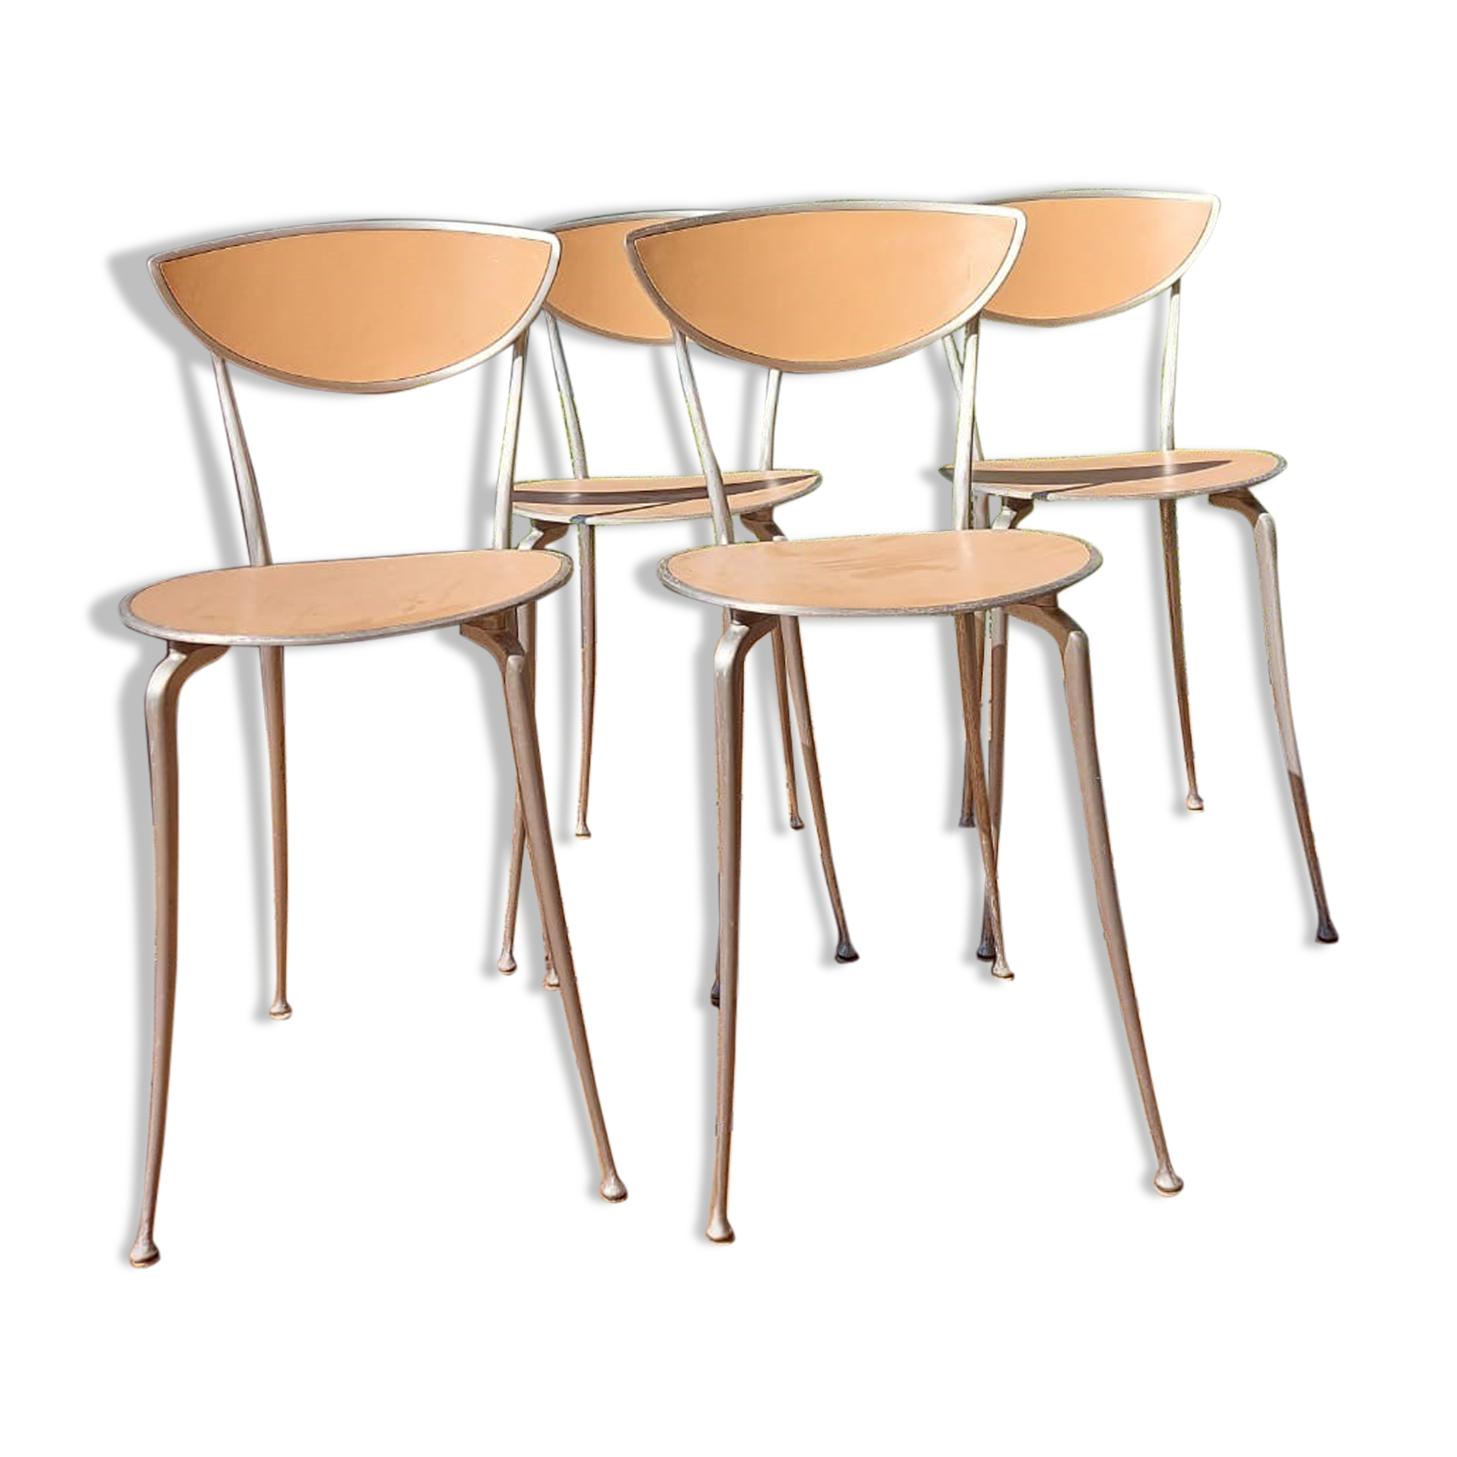 4 chaises style industriel arper